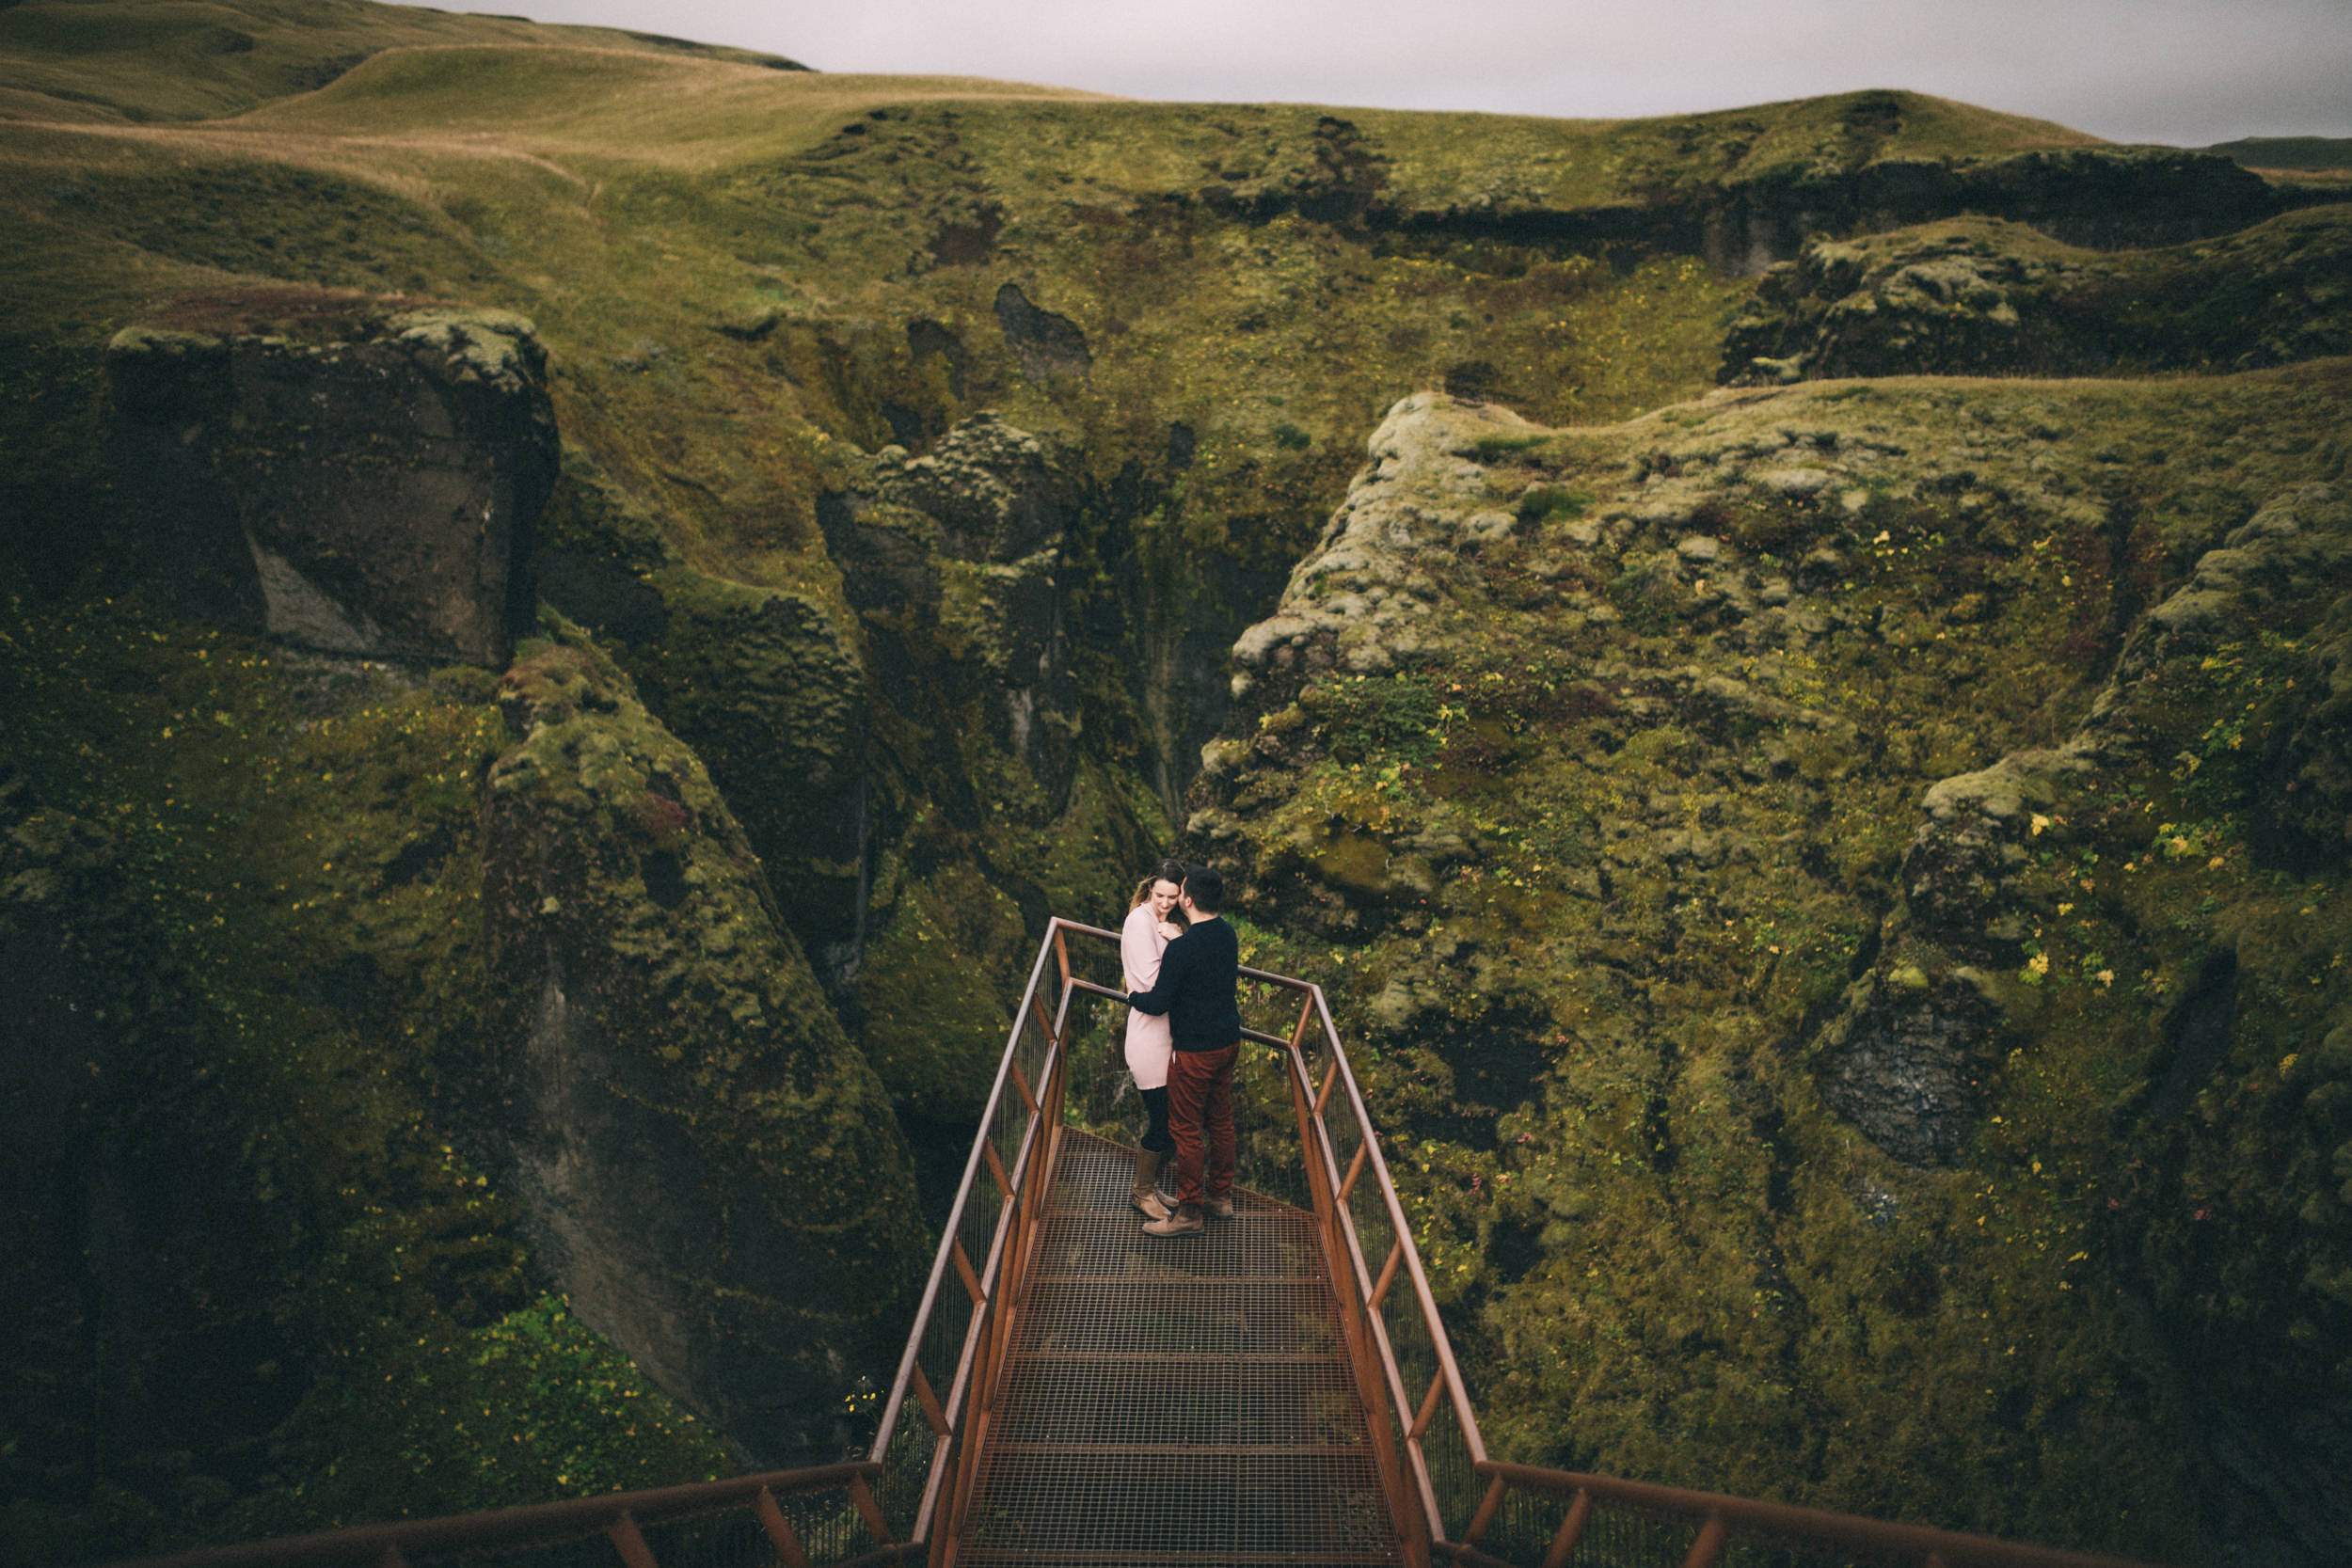 Sarah-Katherine-Davis-Photography-Iceland-Adventure-Elopement-Photographer-Louisville-Kentucky-Wedding-Photographer-Travel-Vik-Beach-Engagement-Session-Cozy-Iceland-South-Coast-66edit.jpg